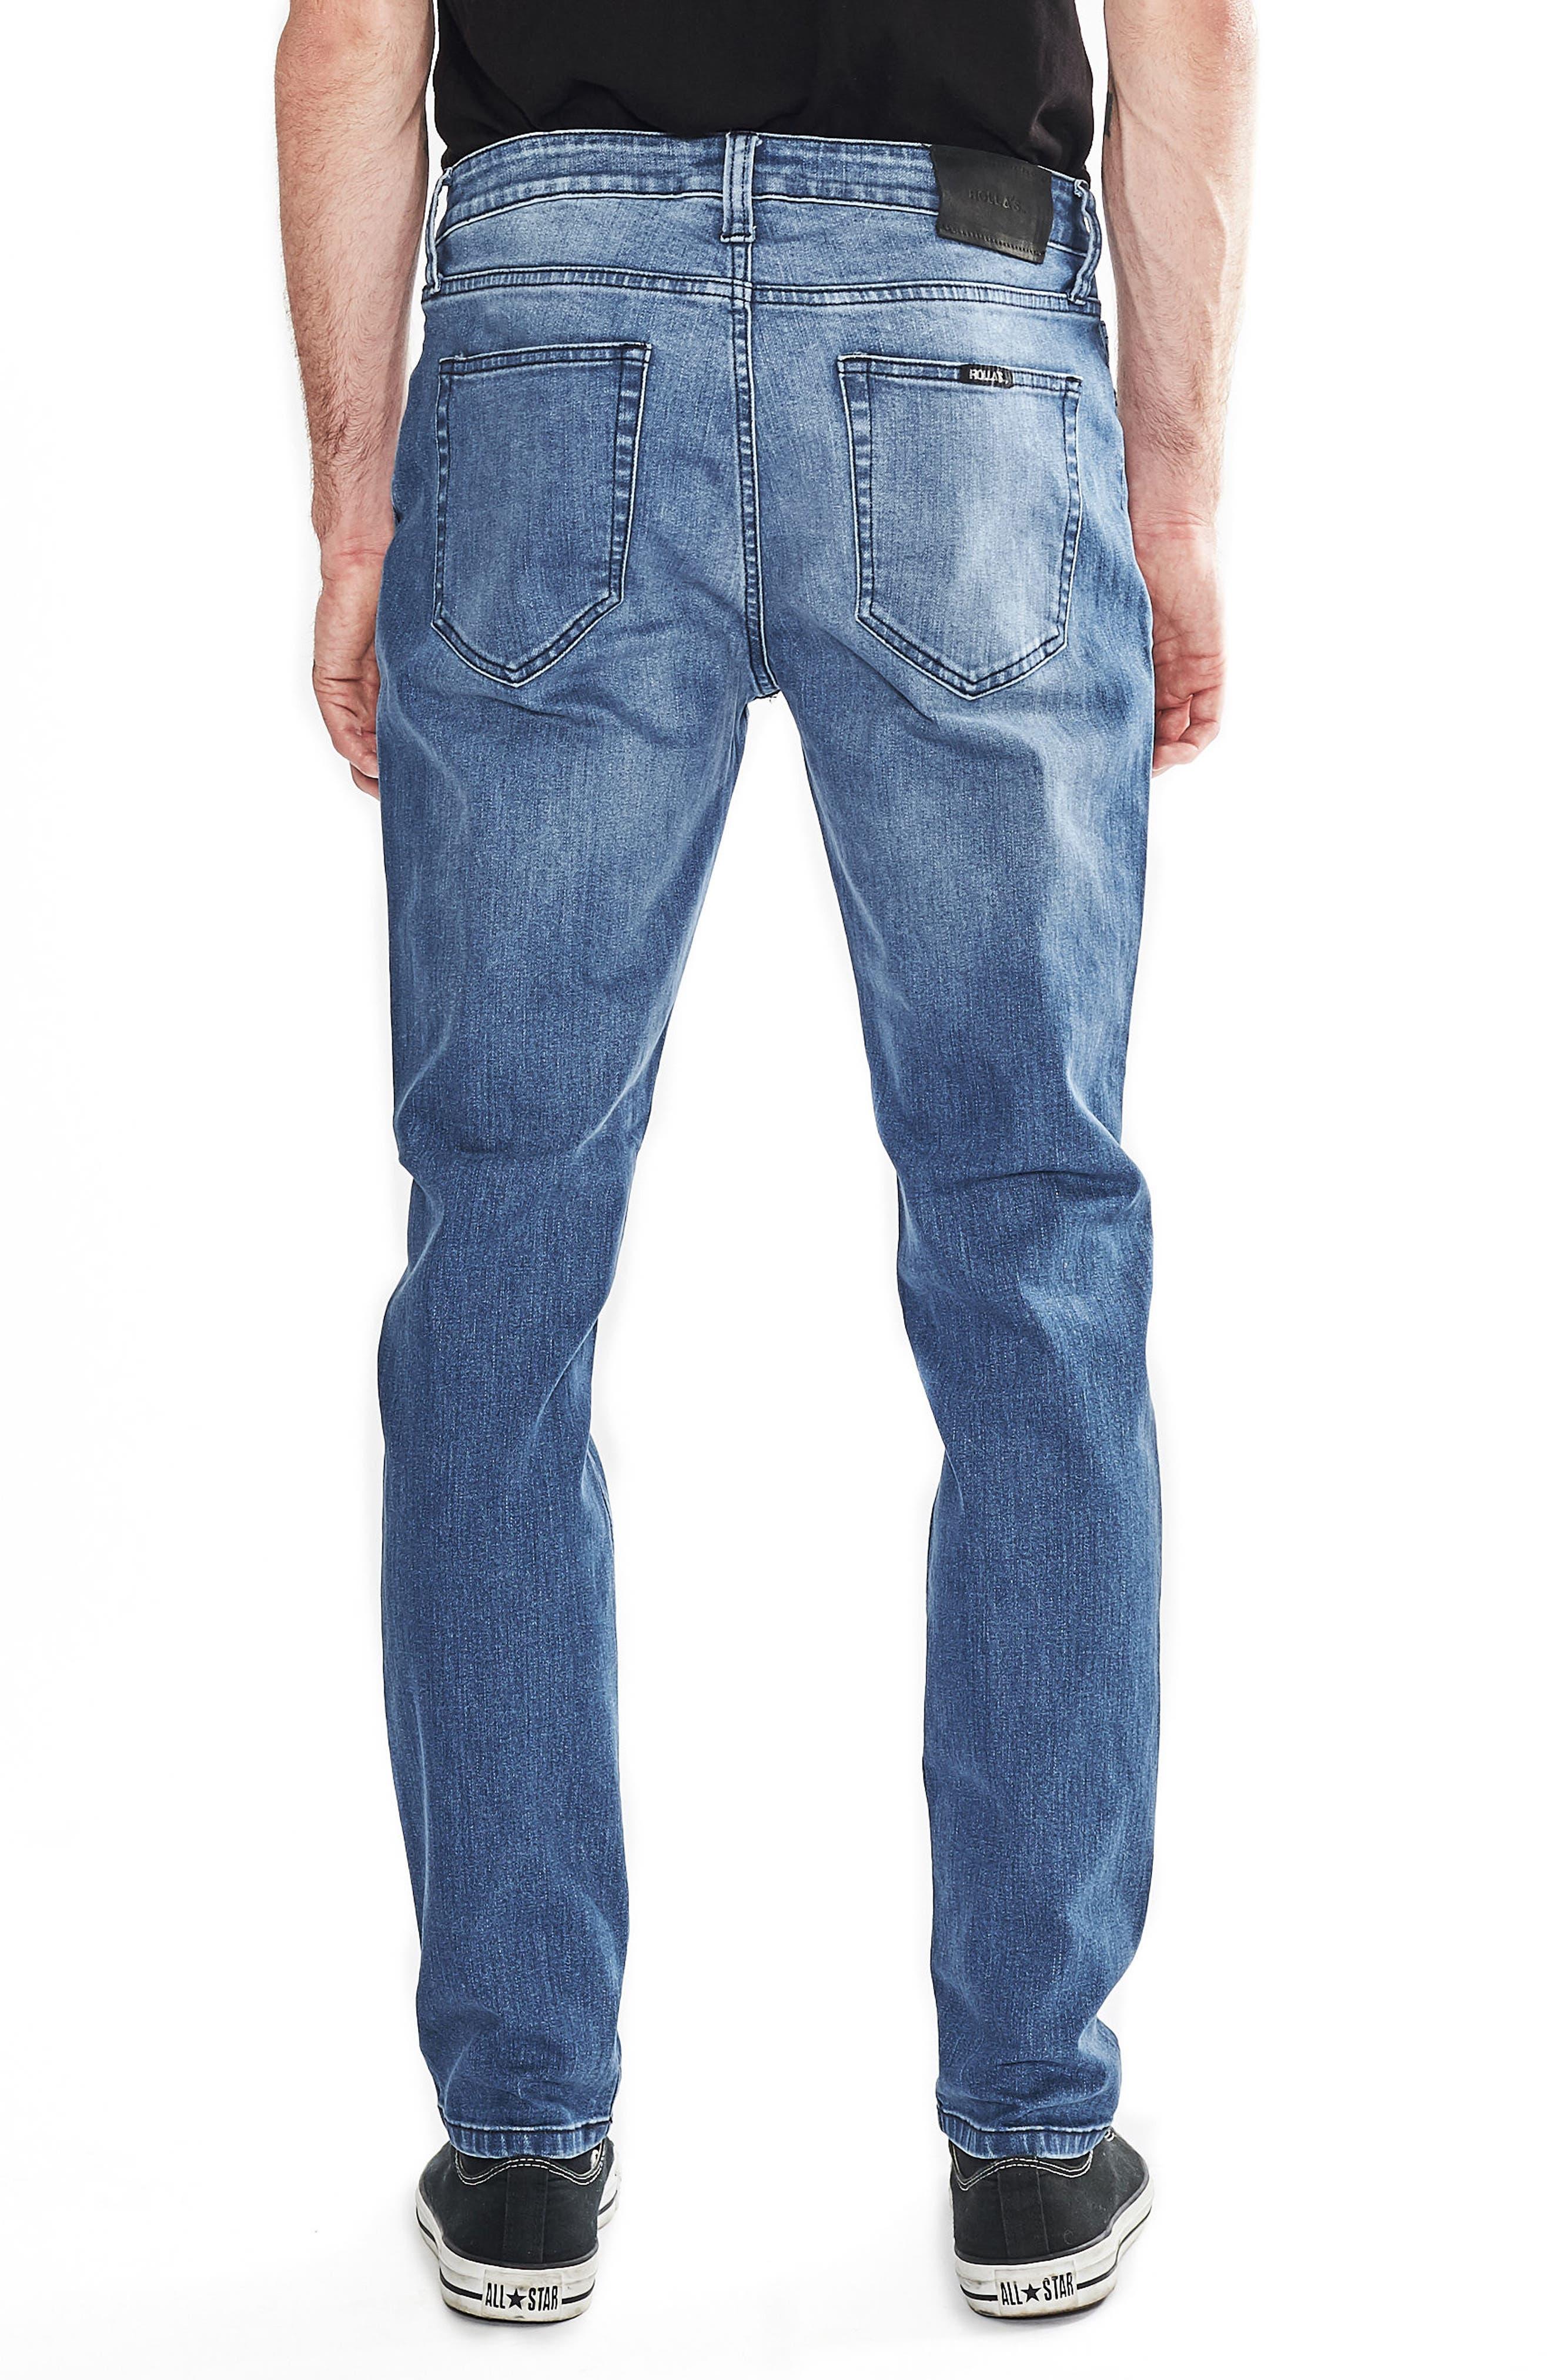 Tim Slims Slim Fit Jeans,                             Alternate thumbnail 2, color,                             Safety Beach Blue